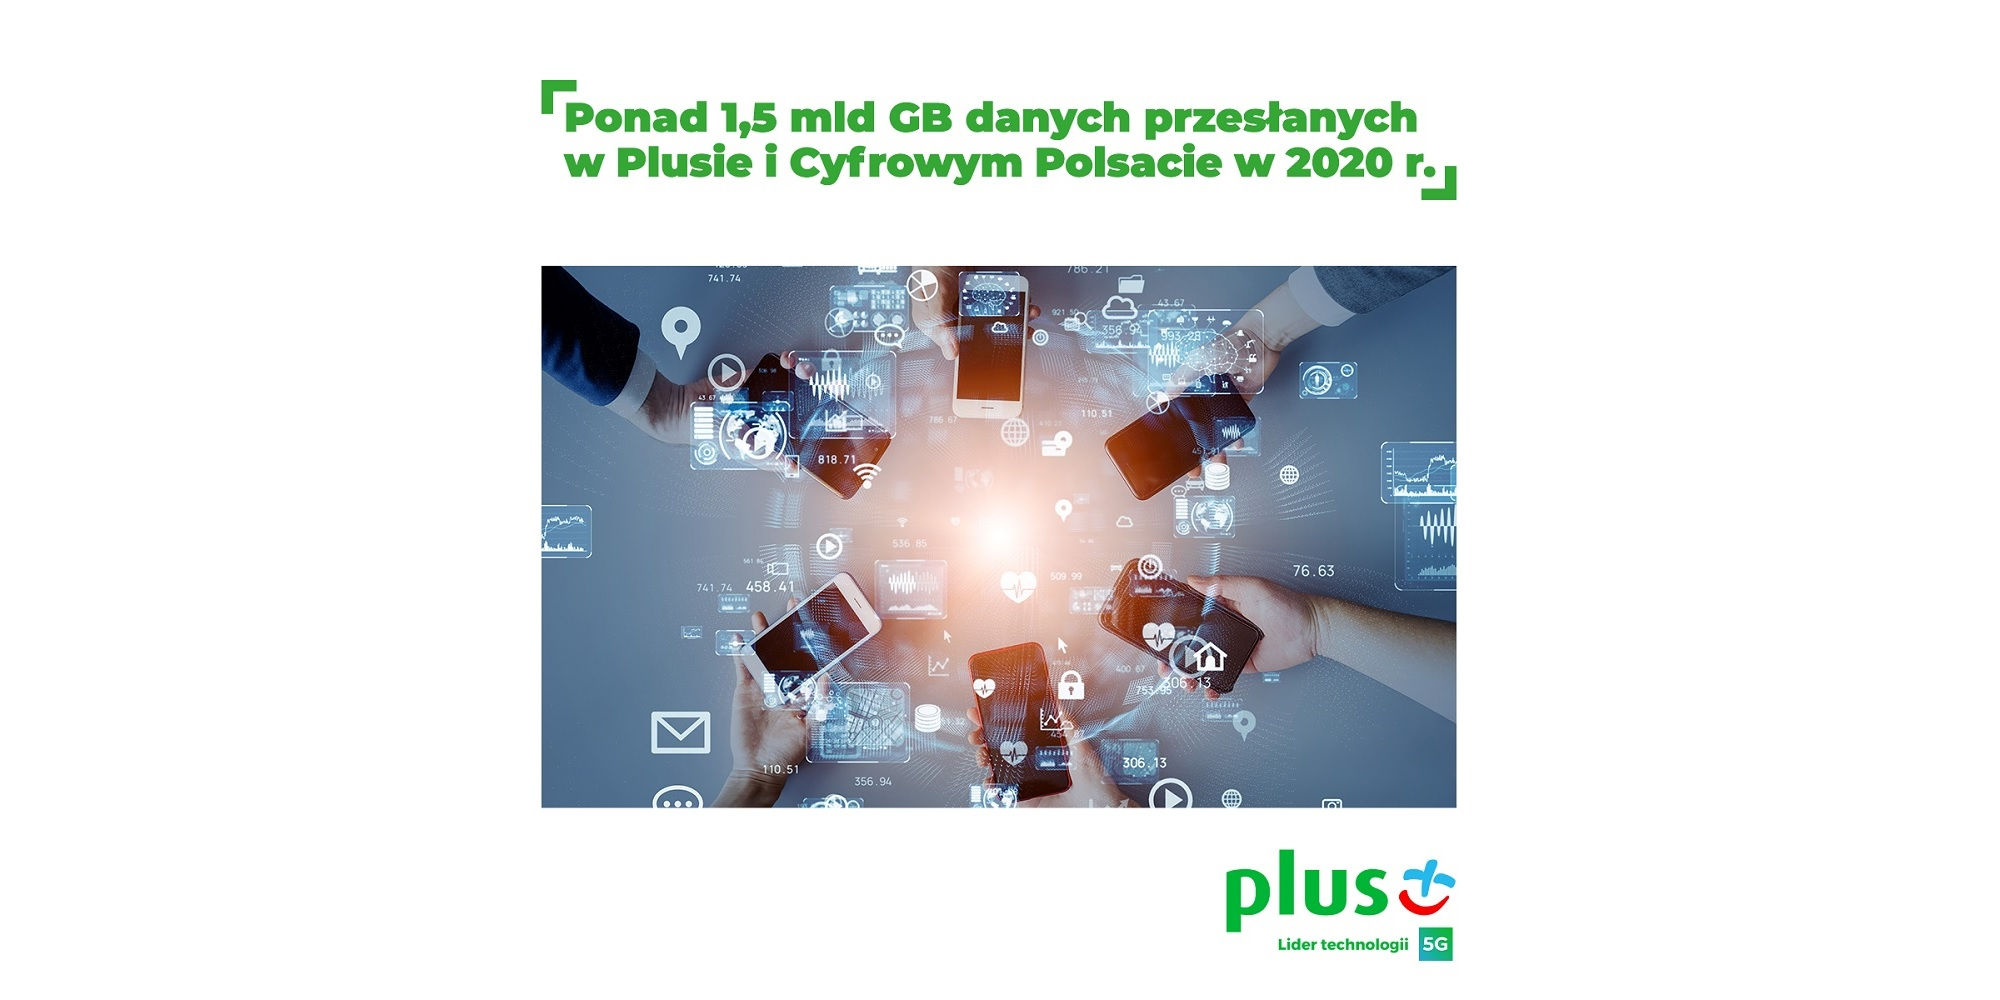 Plus Cyfrowy Polsat internet podsumowanie 2020 rok